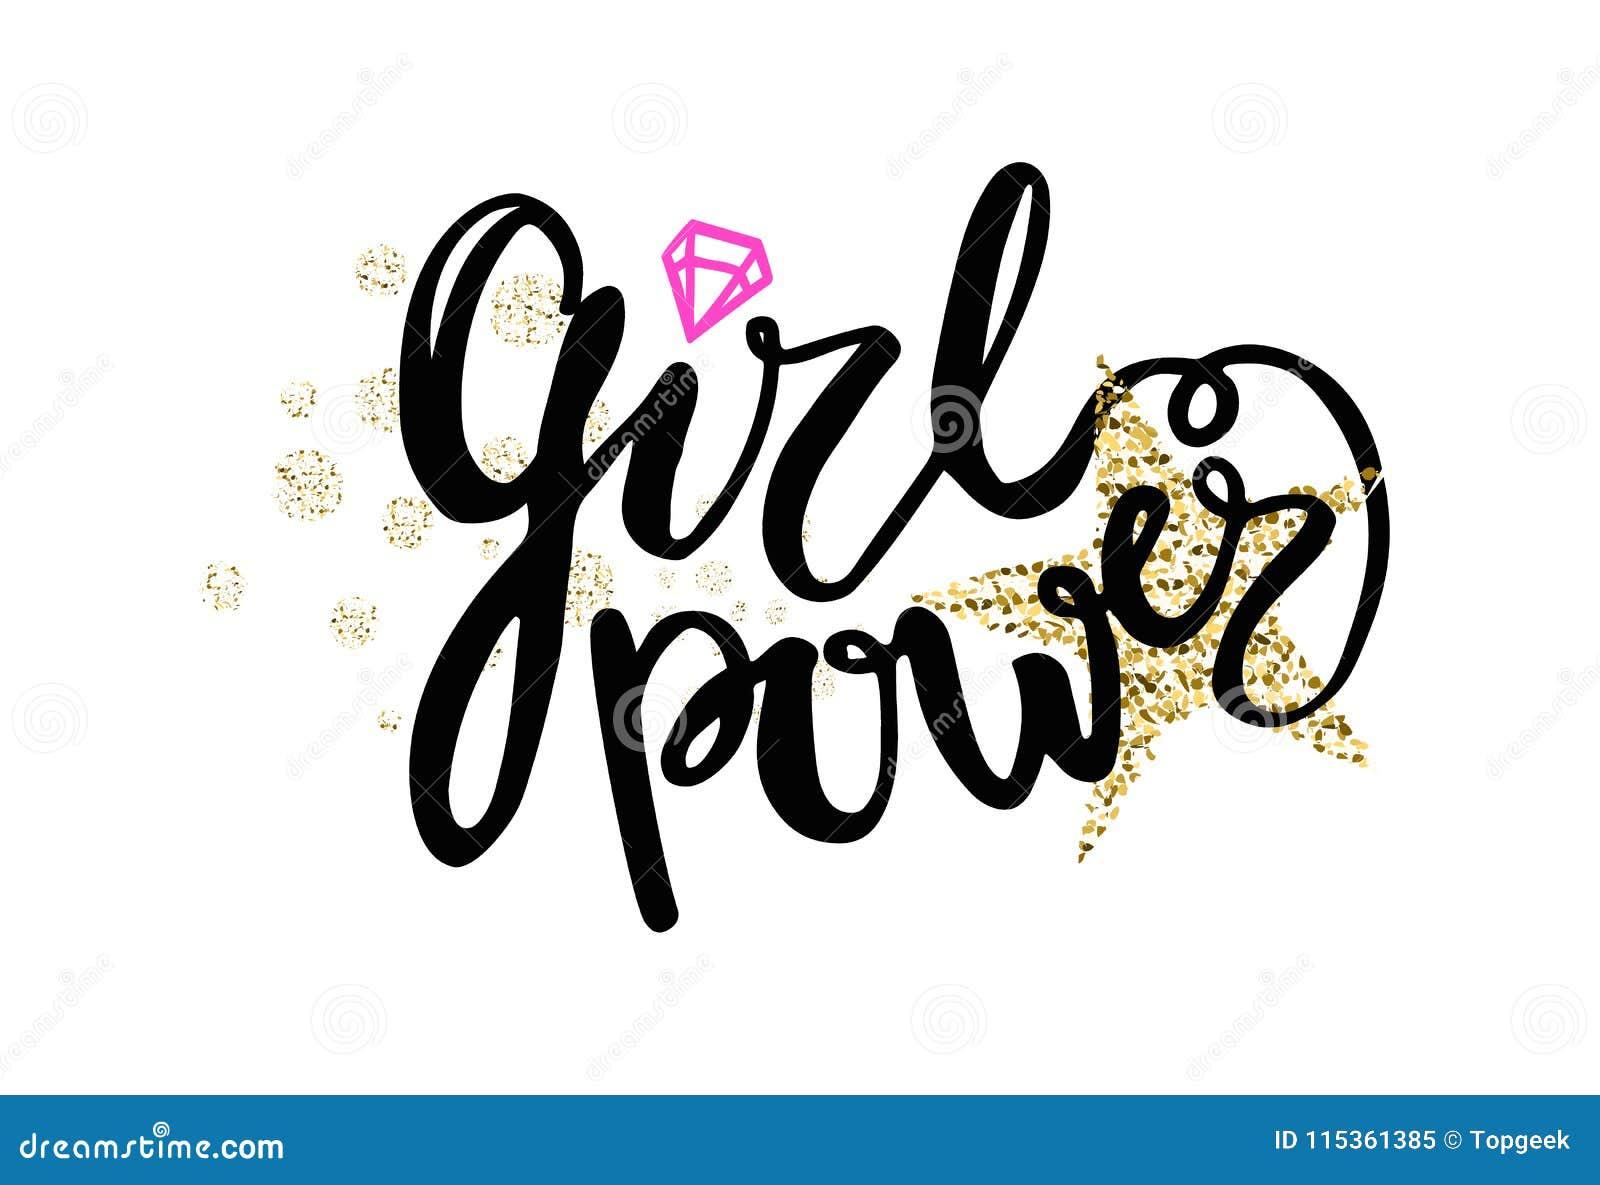 Girl power colorful graffiti vector illustration stock vector jpg 1300x980 diamond graffiti drawing